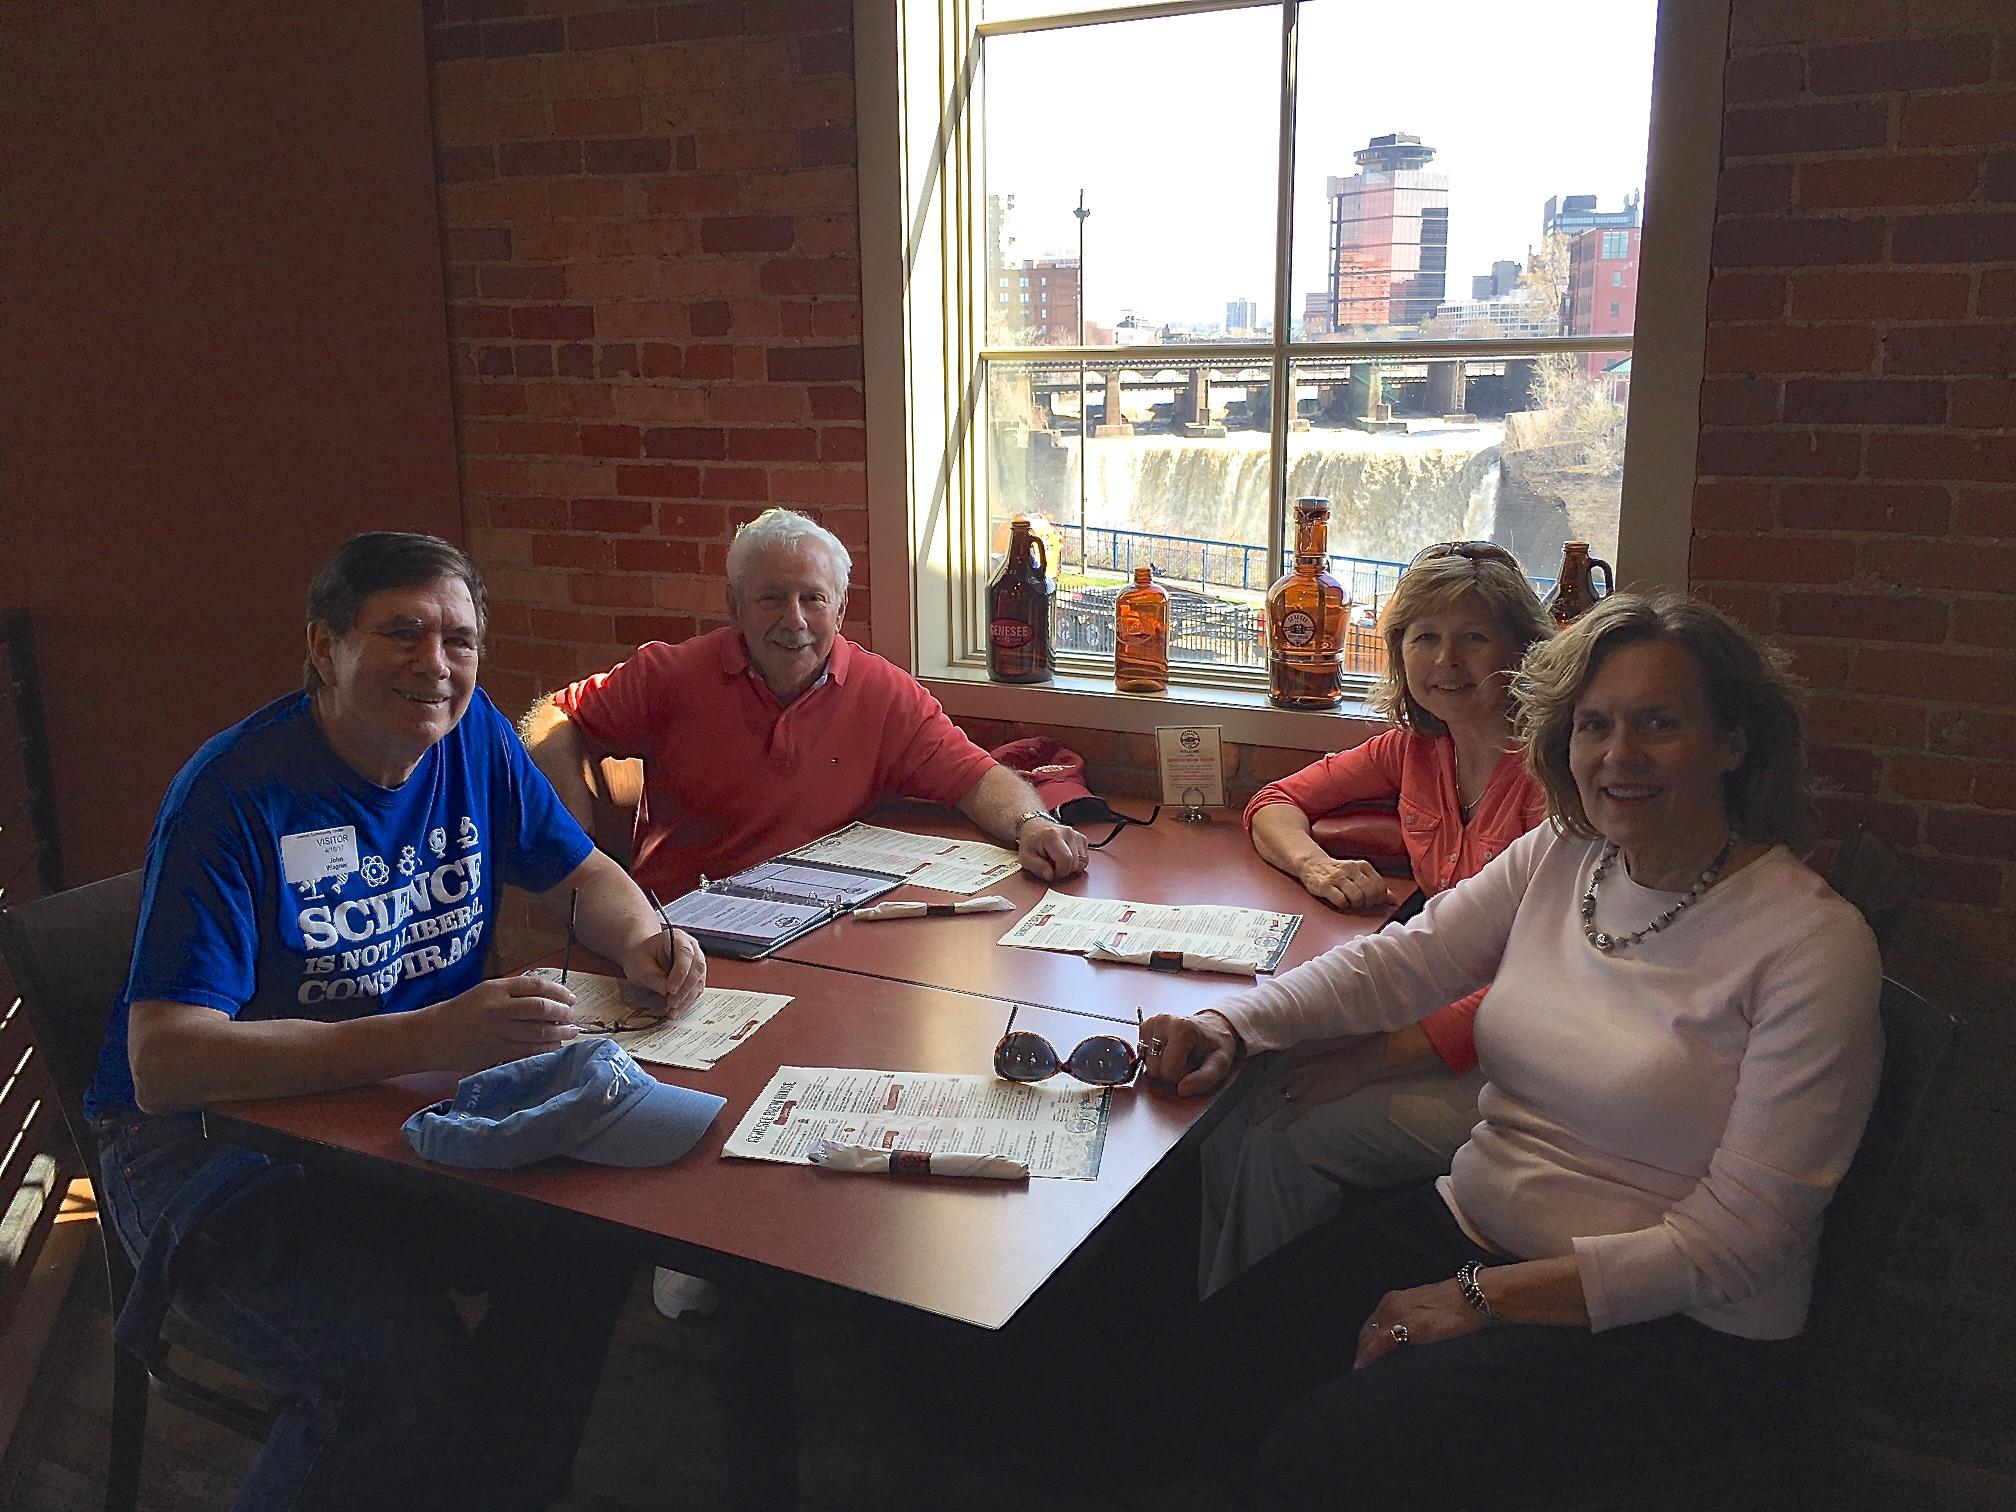 John, Don, Barbara Lohse & Lorraine Gudas 4-16-17